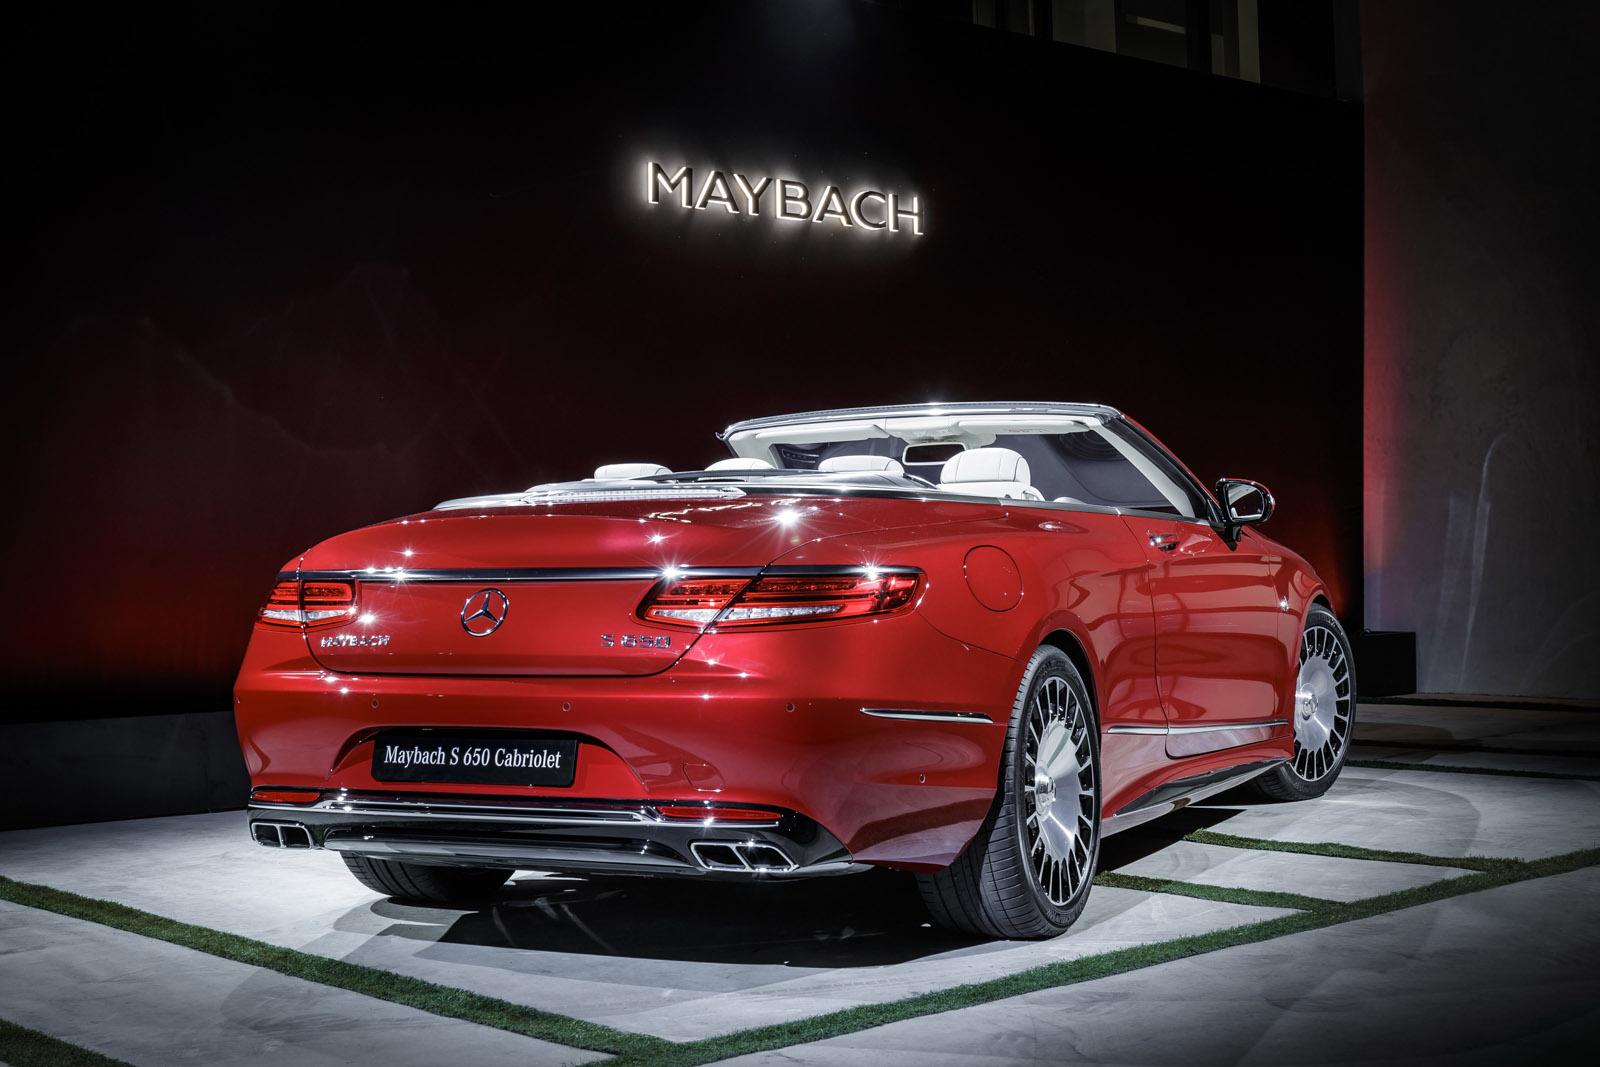 2018 mercedes maybach s650 sedan gets amg 39 s big torquey twelve carscoops. Black Bedroom Furniture Sets. Home Design Ideas